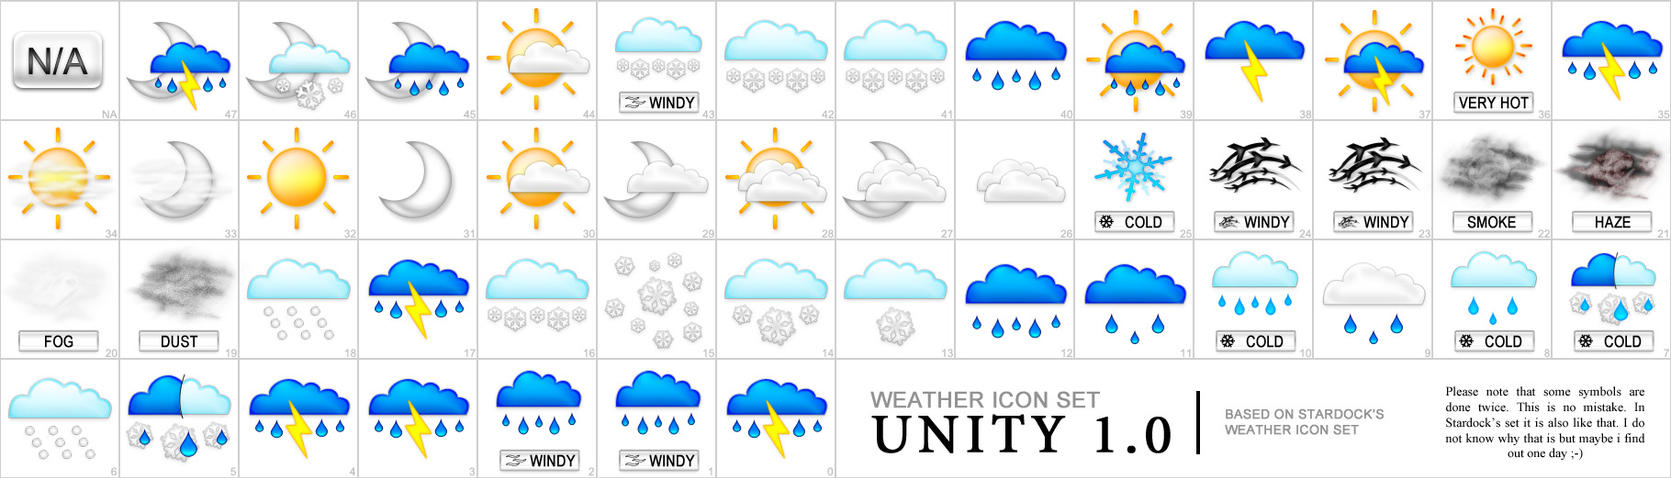 Weather Icon Set Unity 1.0 by Rago